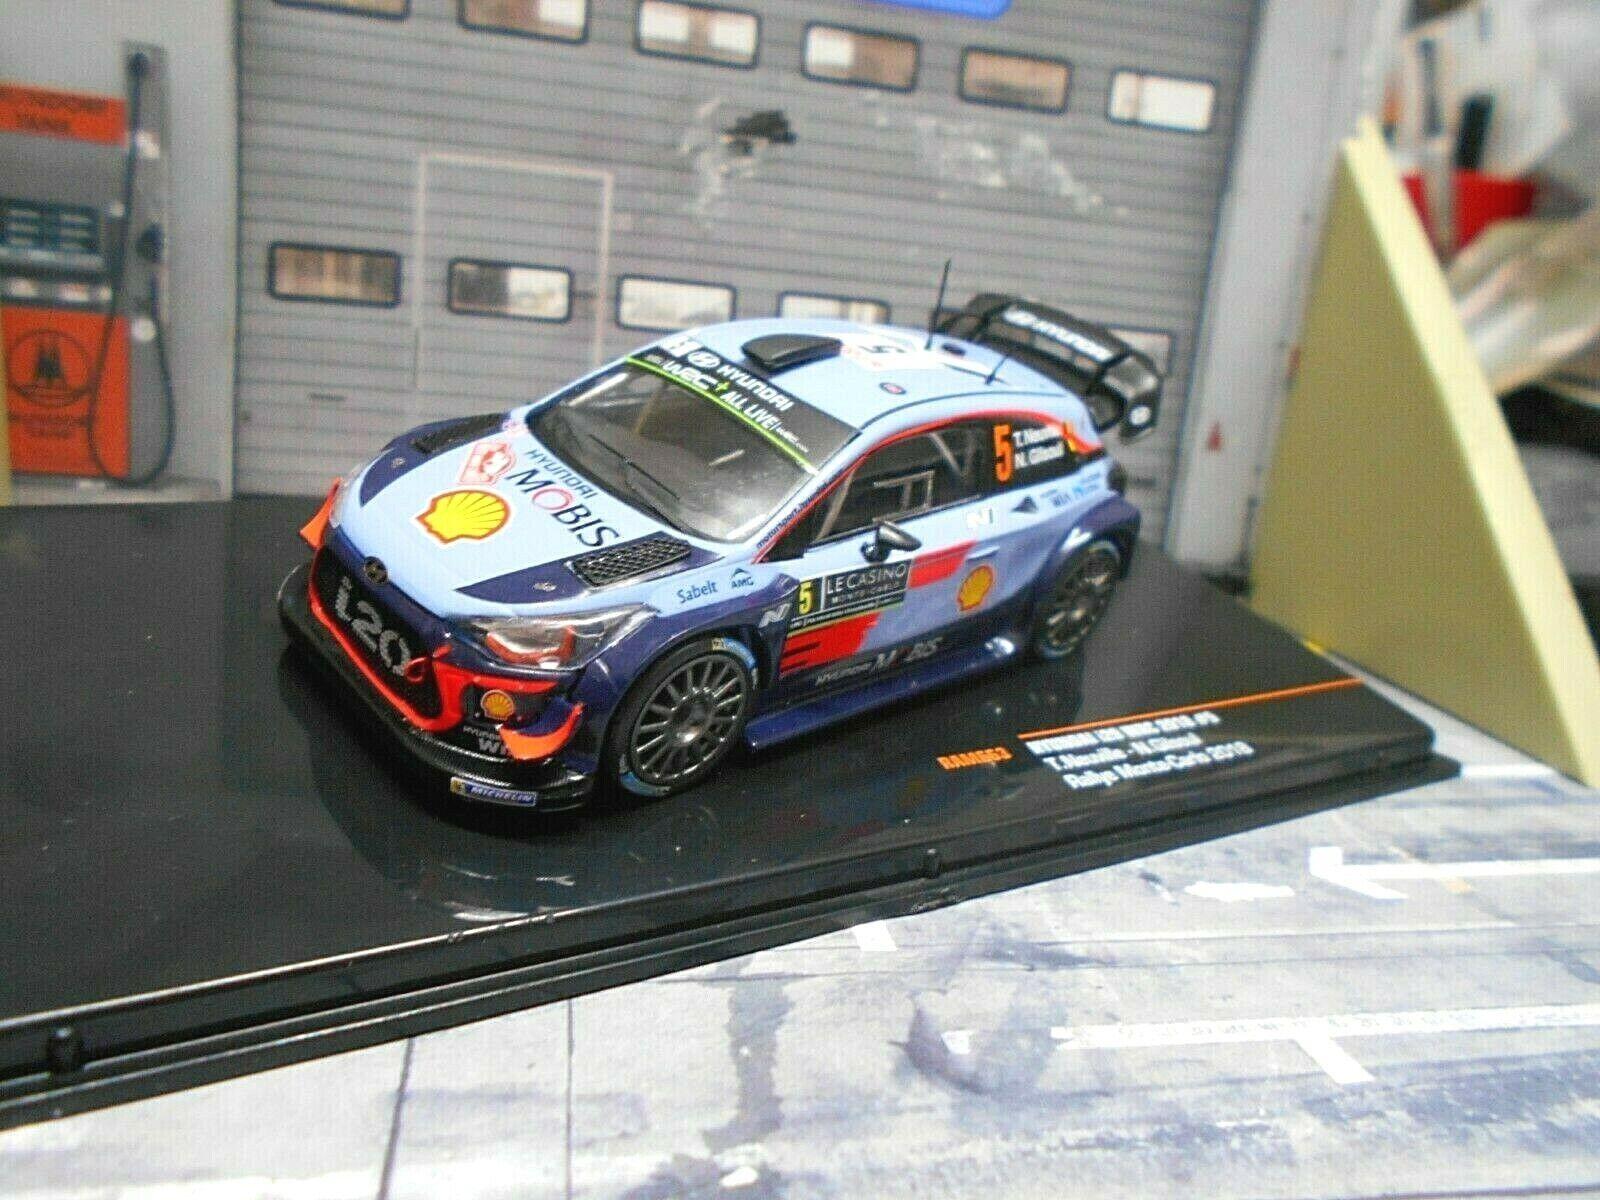 Hyundai i20 WRC Rallye Monte Carlo 2018  5 5 5 NEUVILLE Shell New ram663 Ixo 1 43 6f9c20